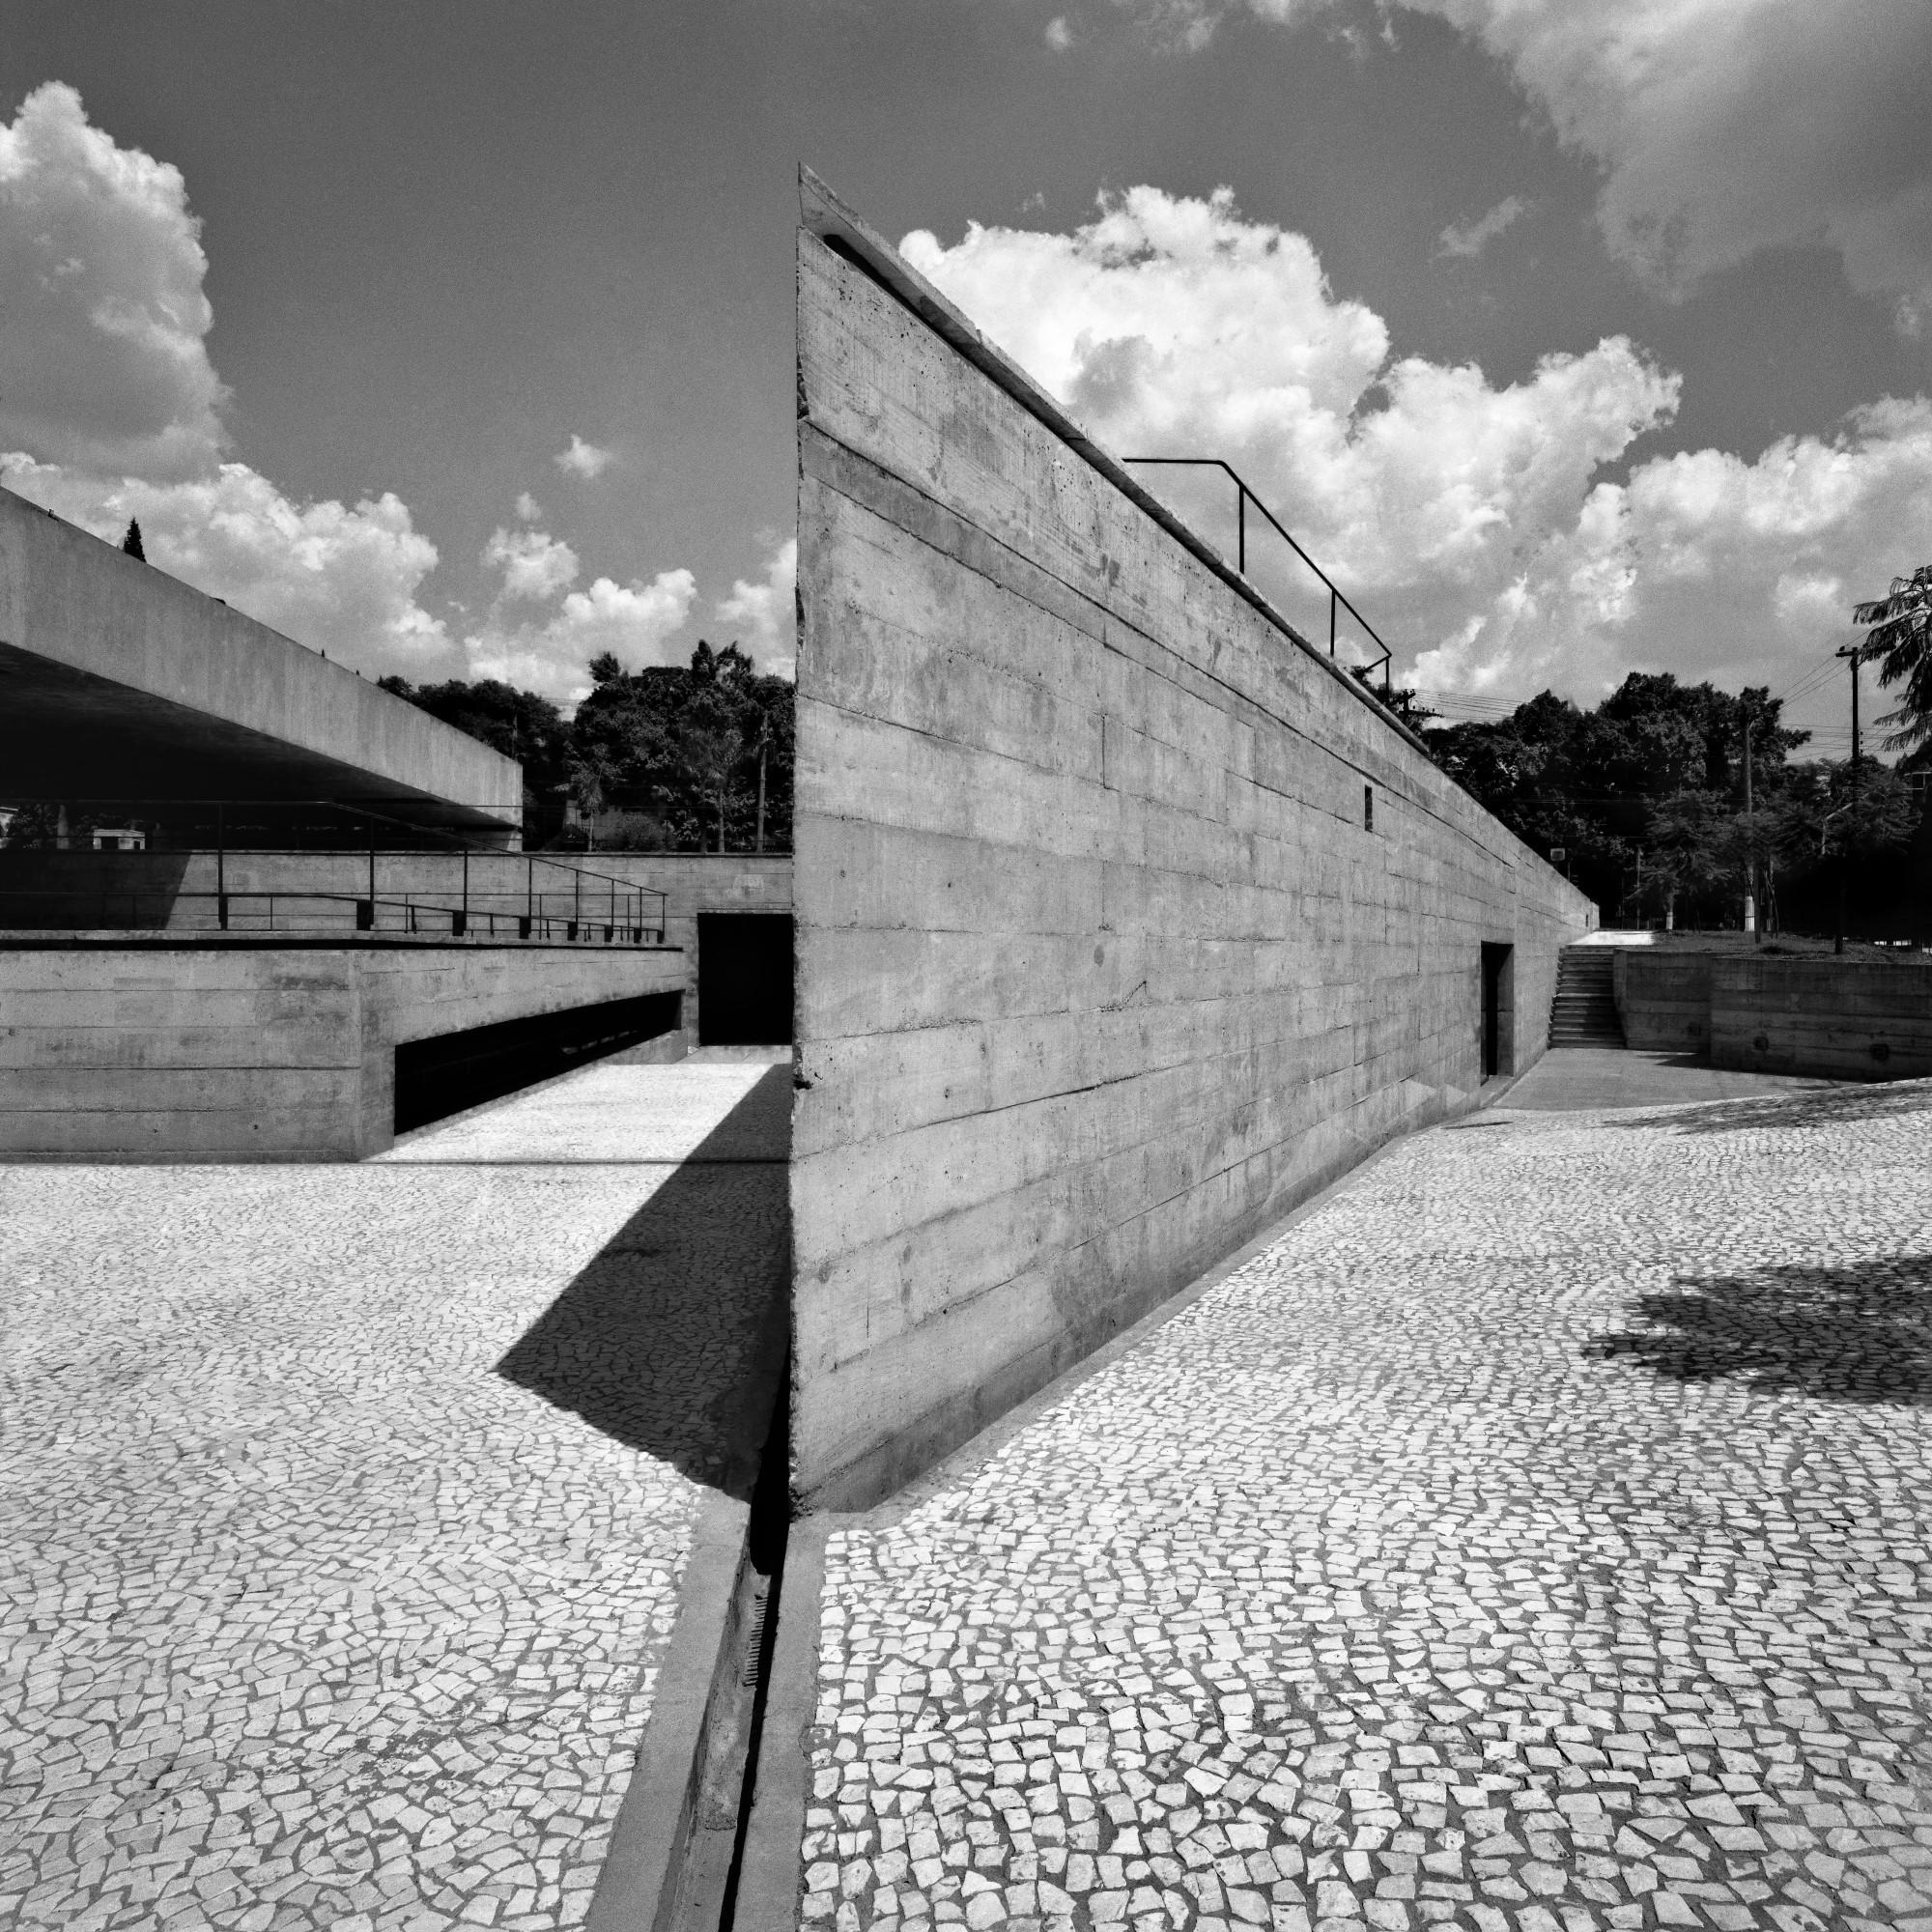 O brilhantismo brutal de Paulo Mendes da Rocha